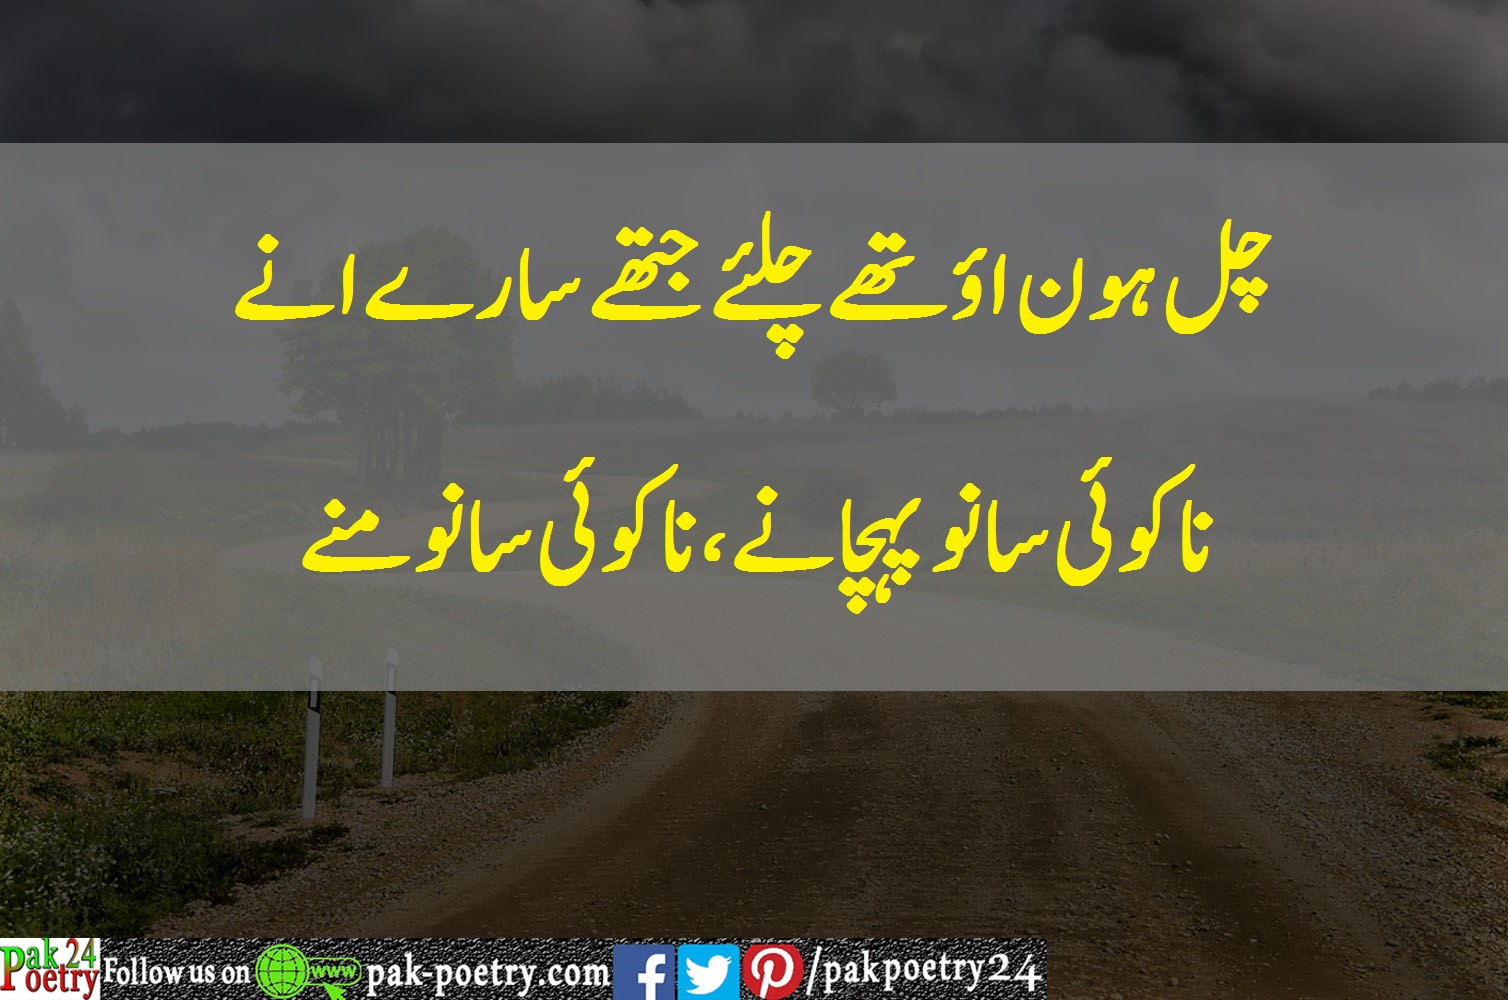 Punjabi Poetry & Shayari - Top 5 Collection | Pak Poetry 24